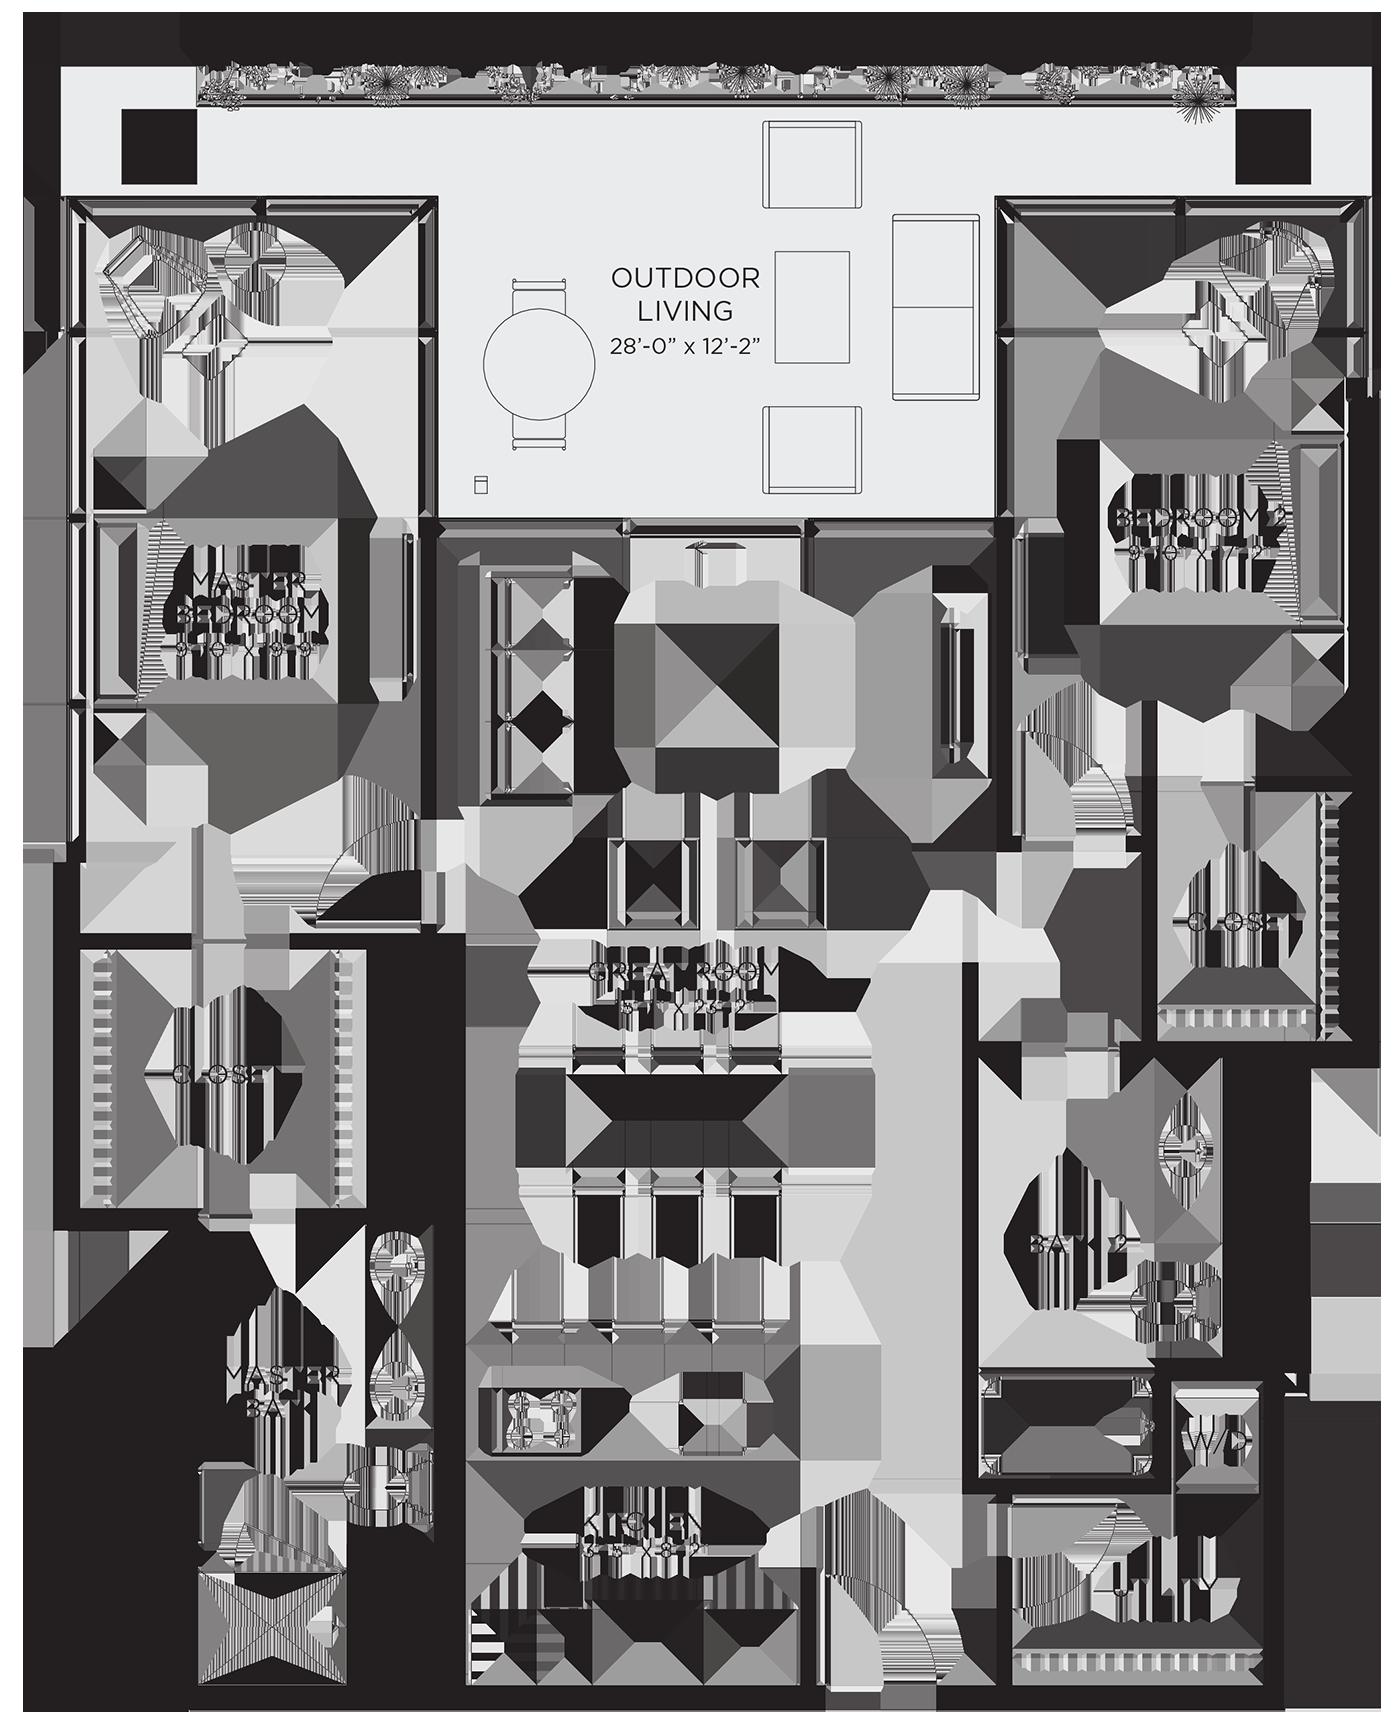 Unit 02Ha Floor Plan